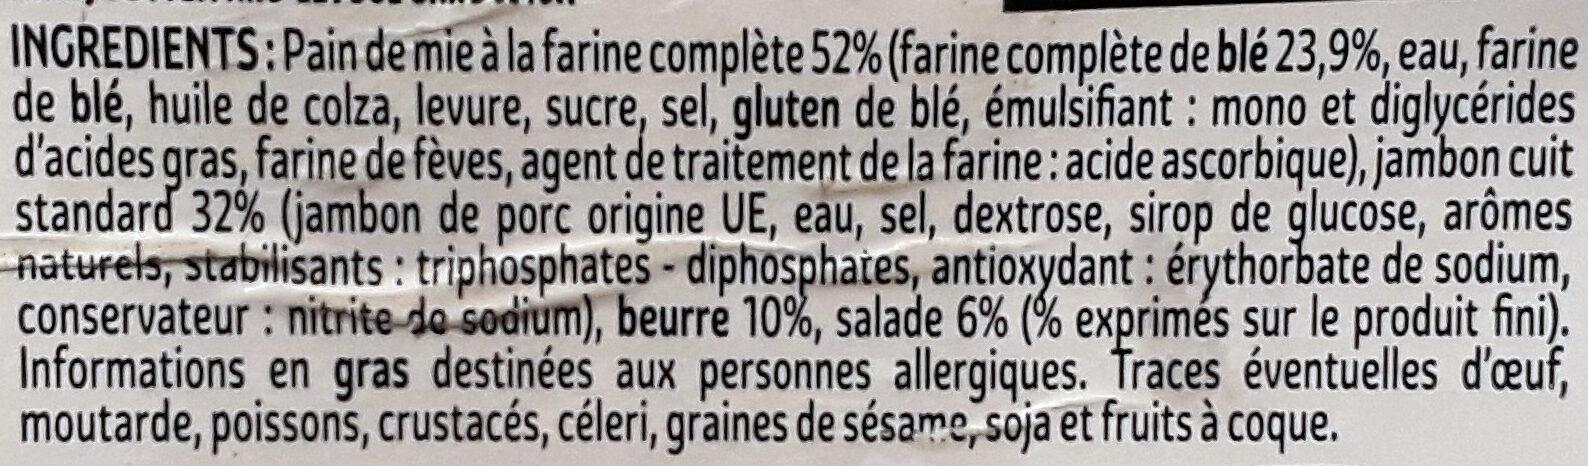 Jambon beurre salade fraîcheur XXL - Ingrédients - fr